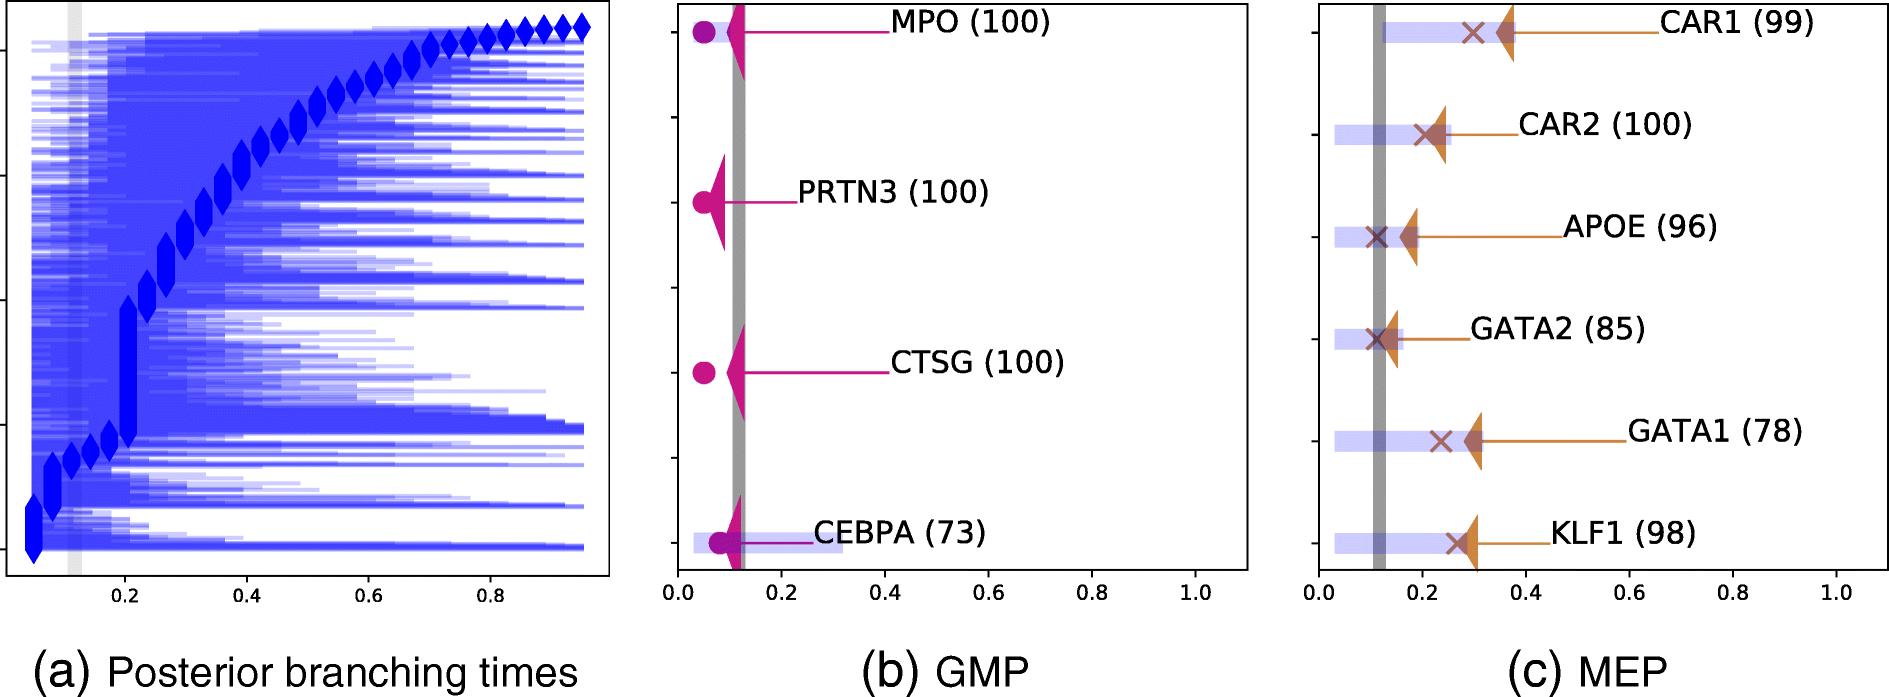 BGP: identifying gene-specific branching dynamics from